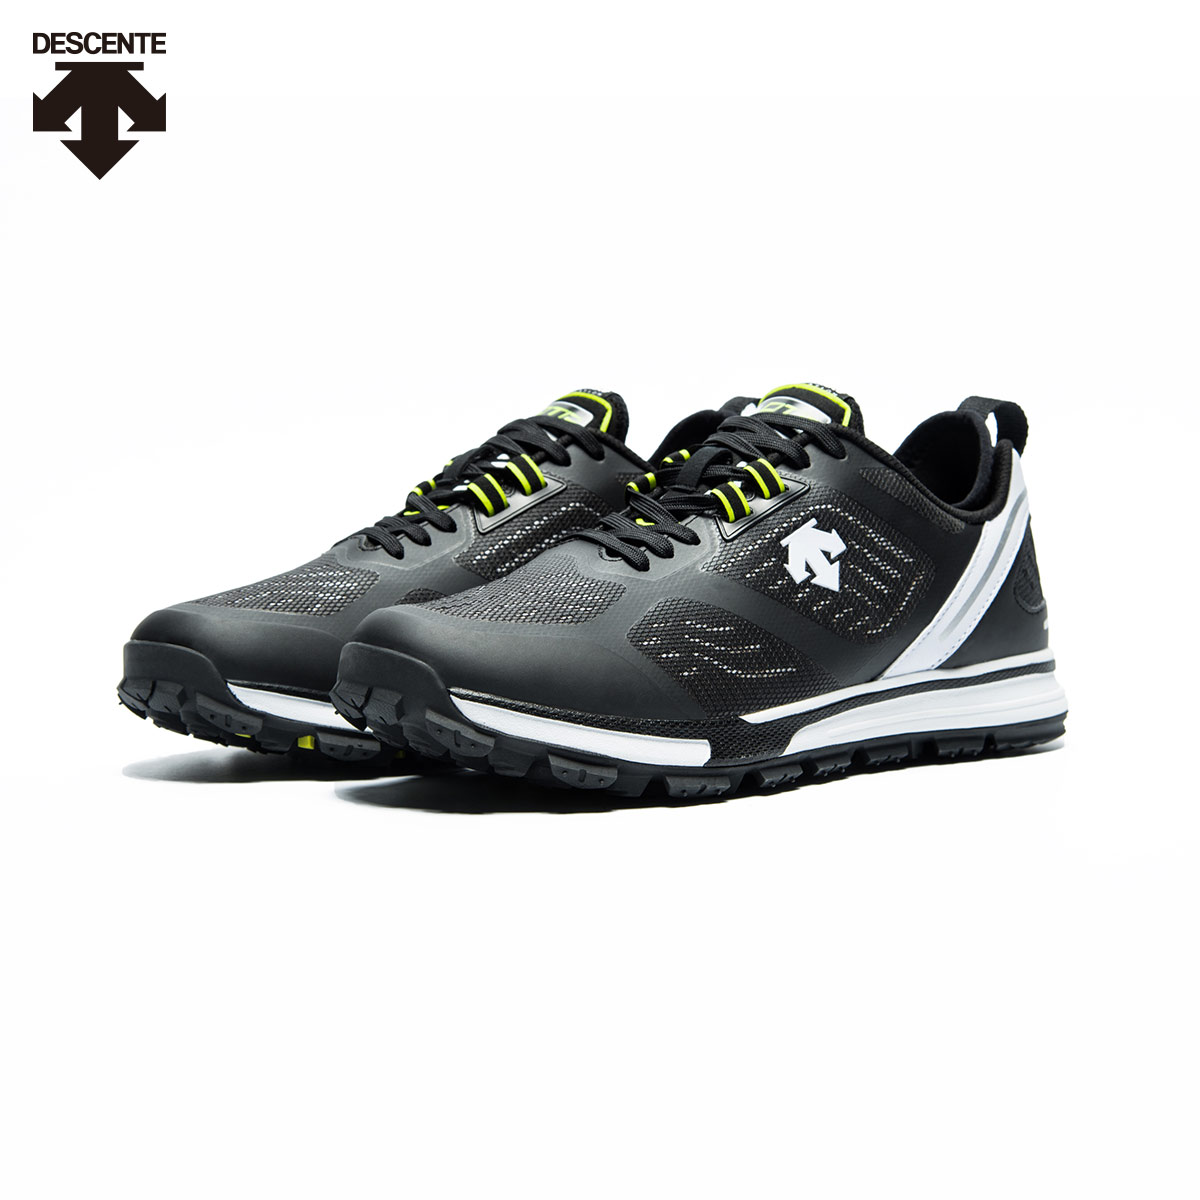 DESCENTE迪桑特男鞋 RUNNING系列 男女款跑步运动鞋 D7429RRN56